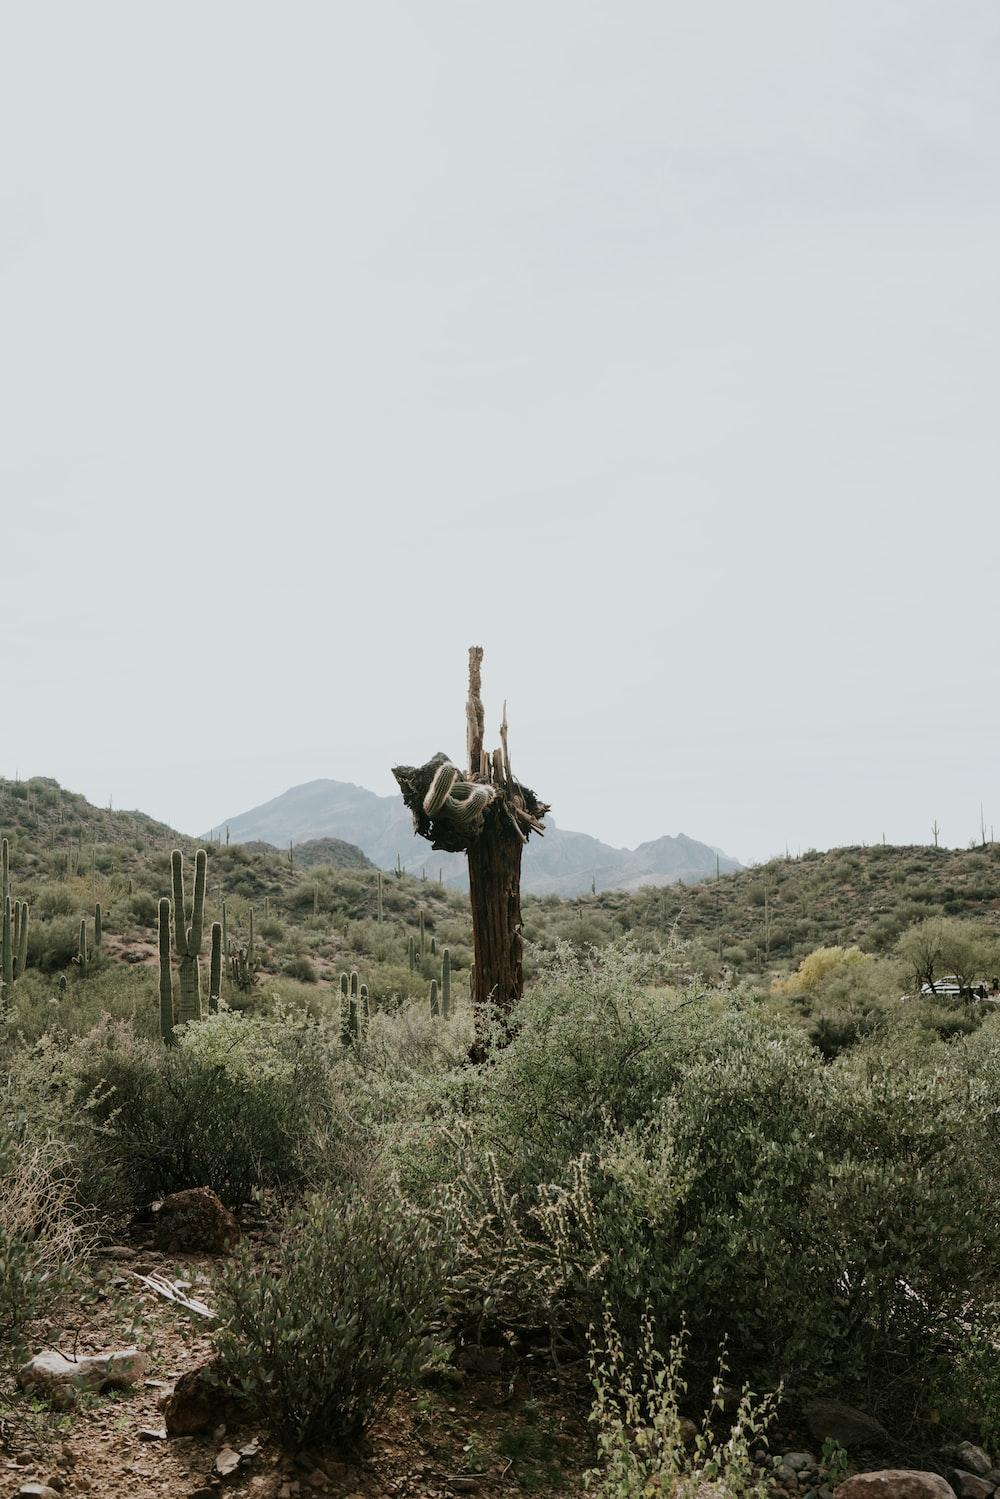 cactus plants on grass plants